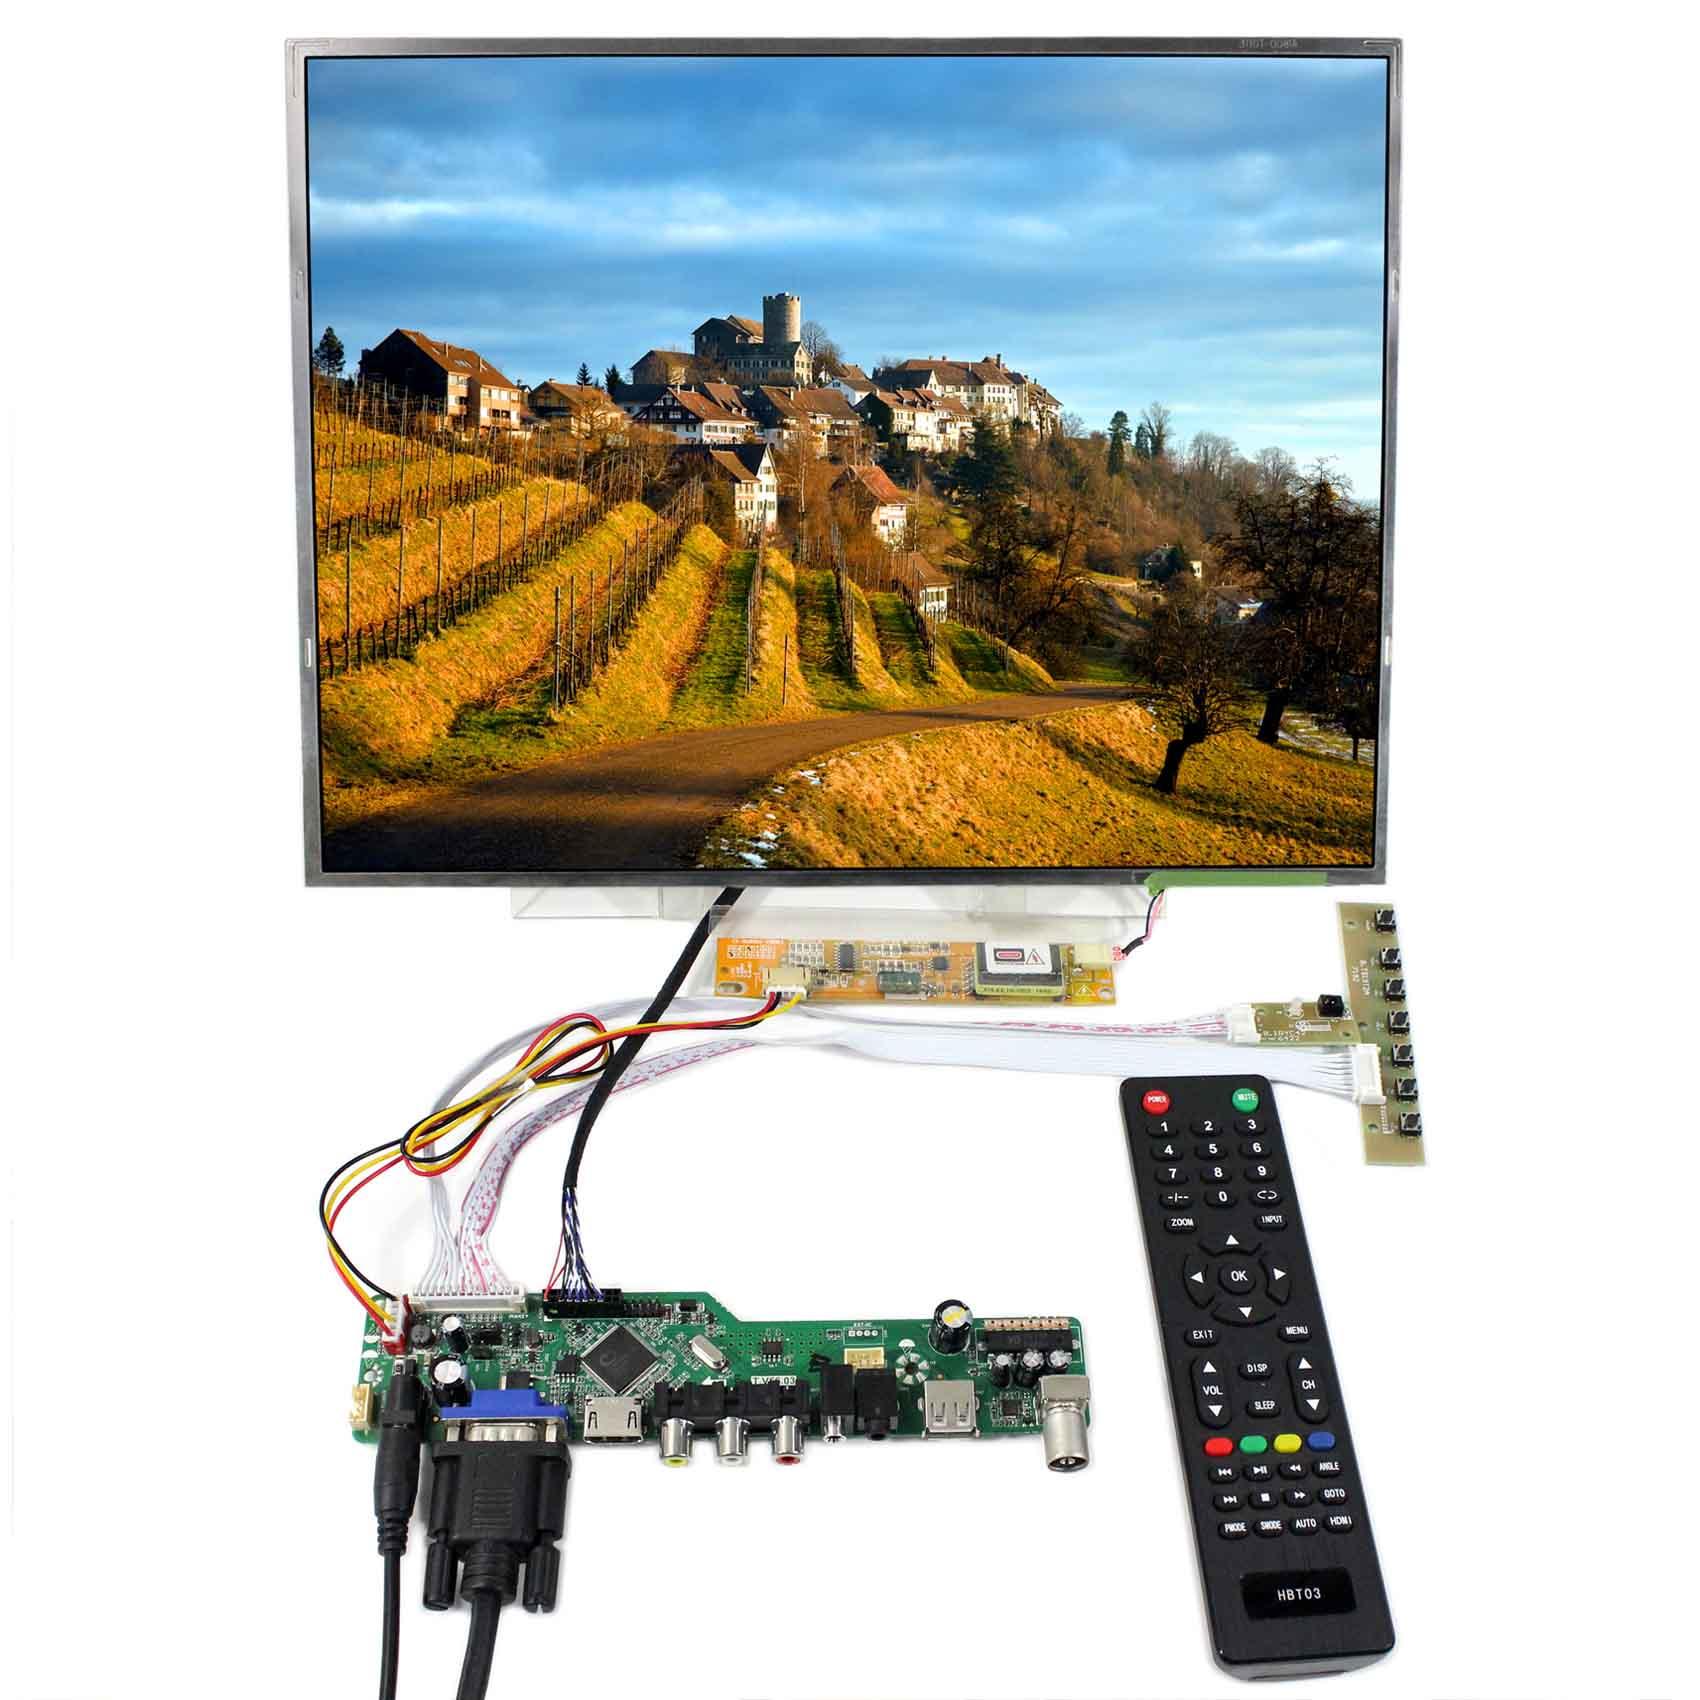 30pins LVDS Connector QD15XL06 1024X768 Resolution LP150X09 HDMI VGA AV USB RF LCD Controller Board B150XG03 15inch LCD Screen